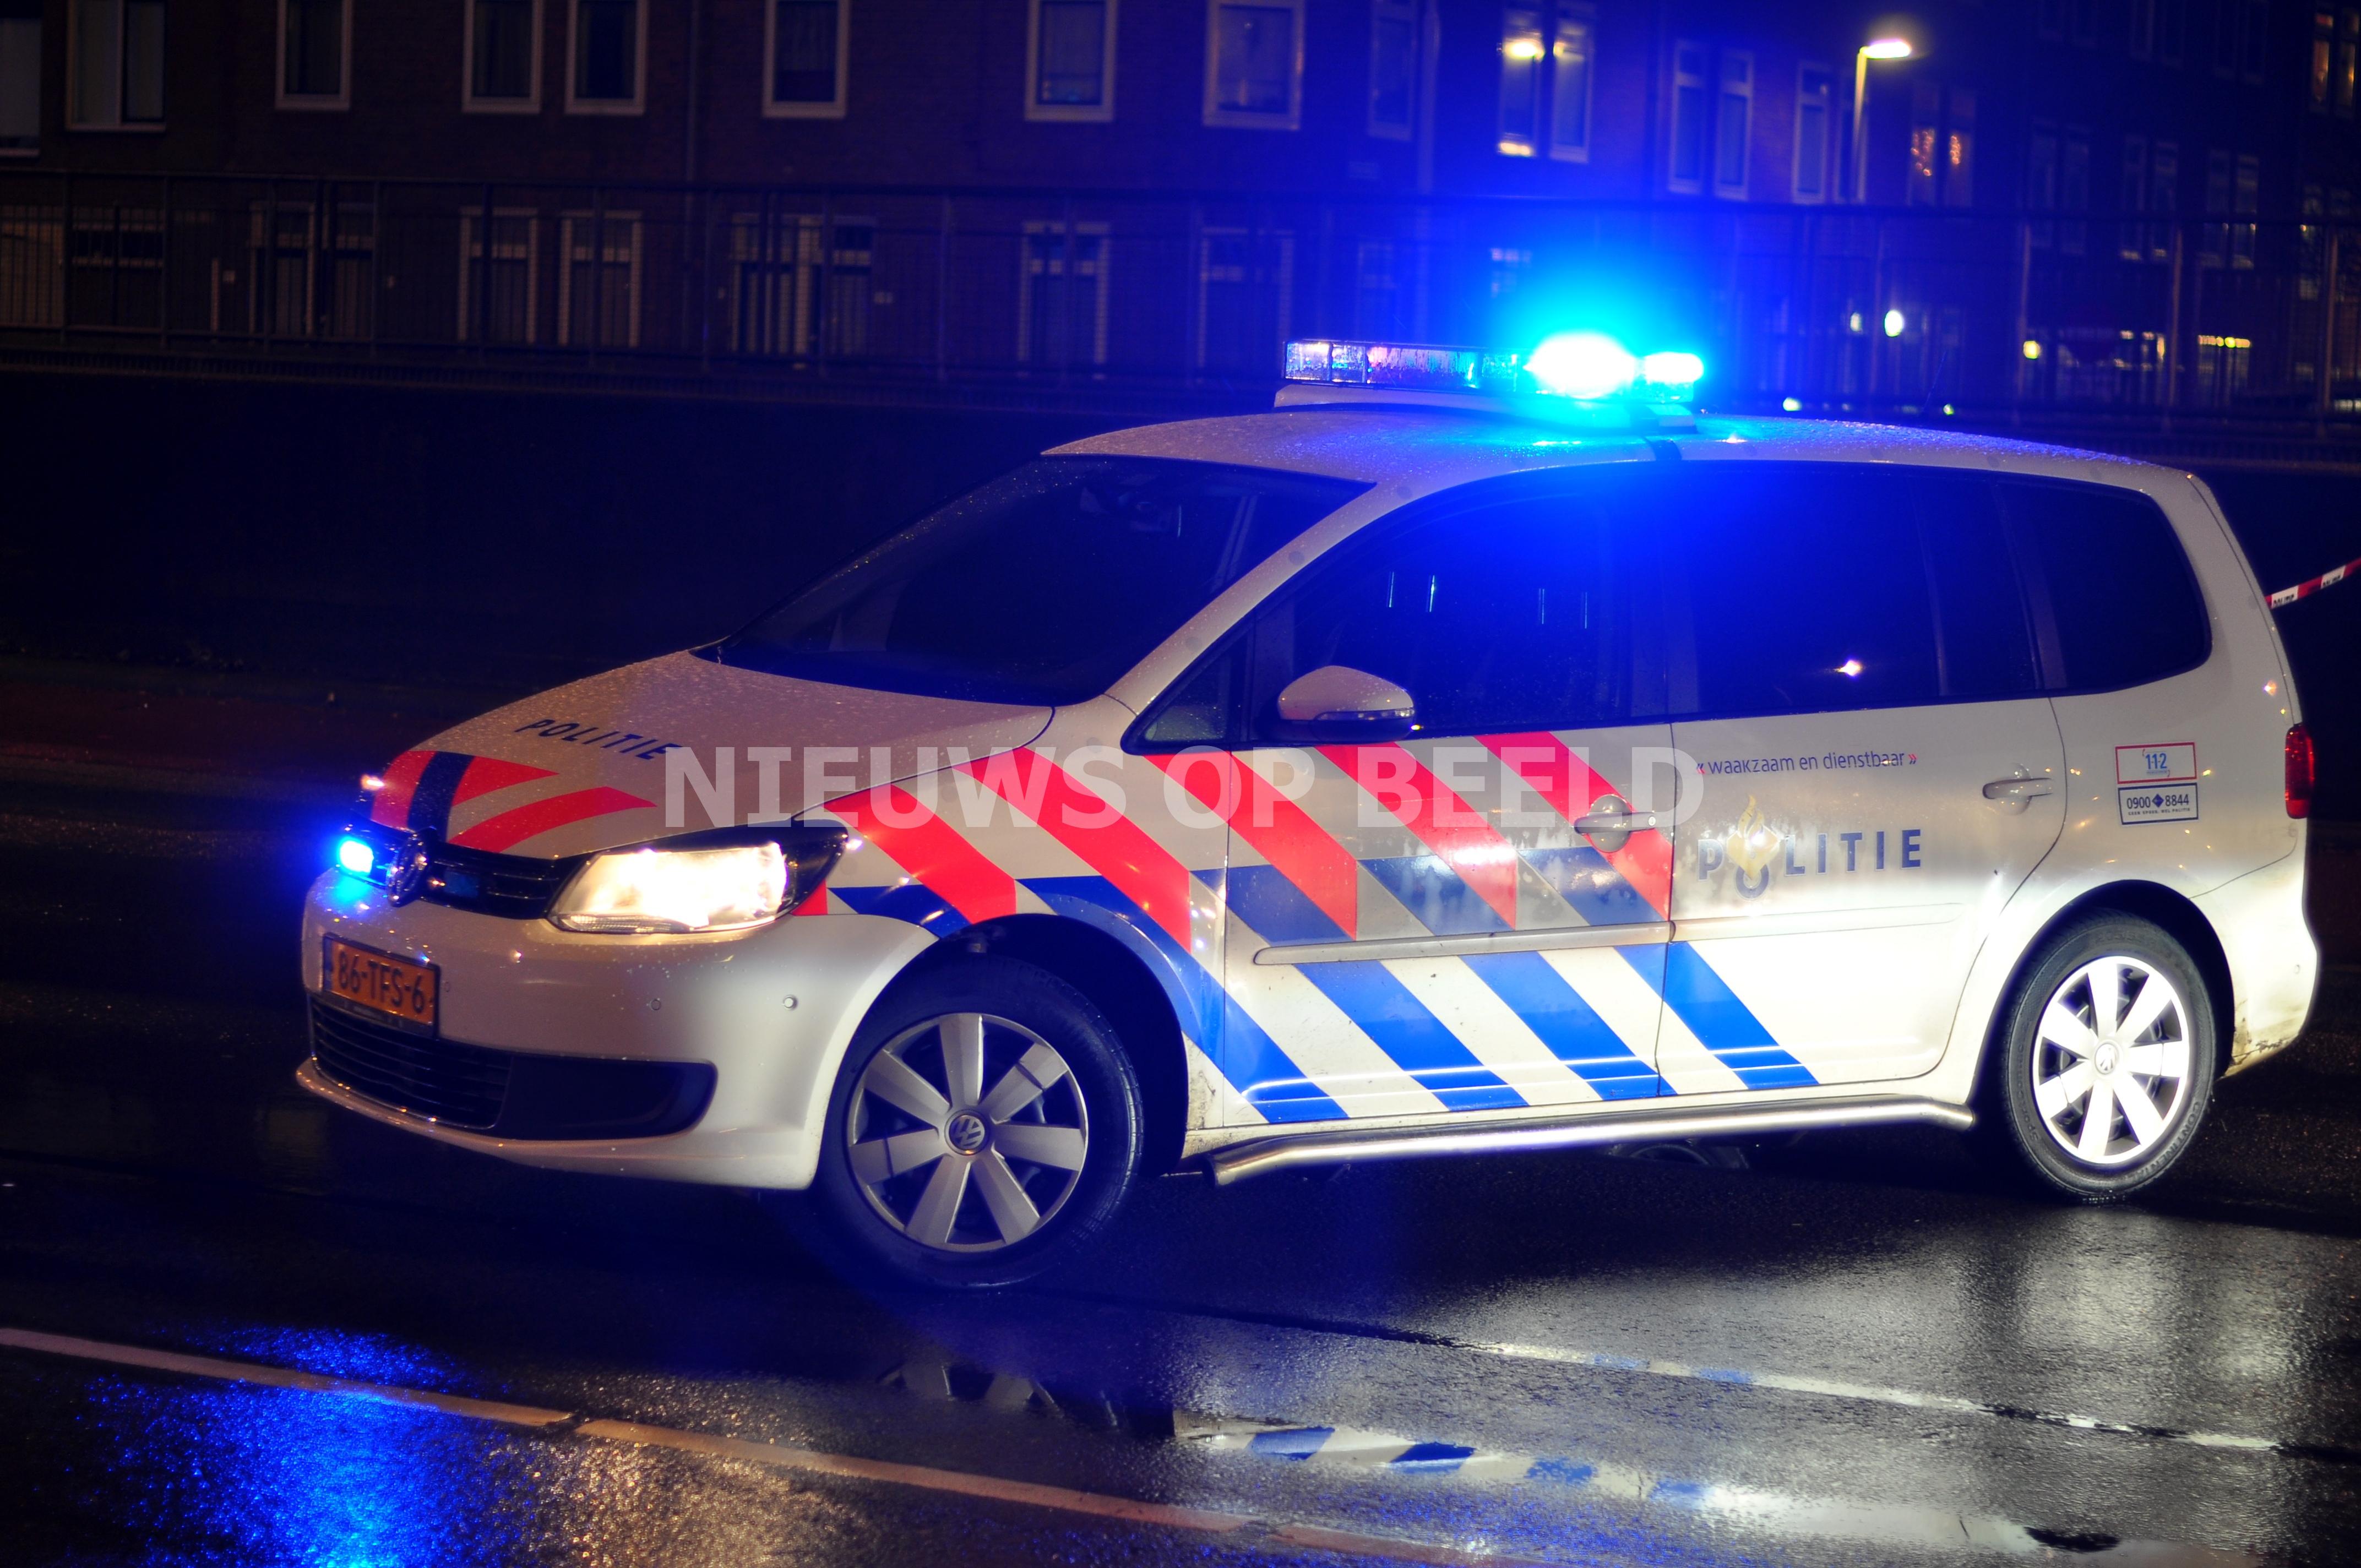 Getuigenoproep vechtpartij horecagelegenheid Kromme Elleboogsteeg Haarlem